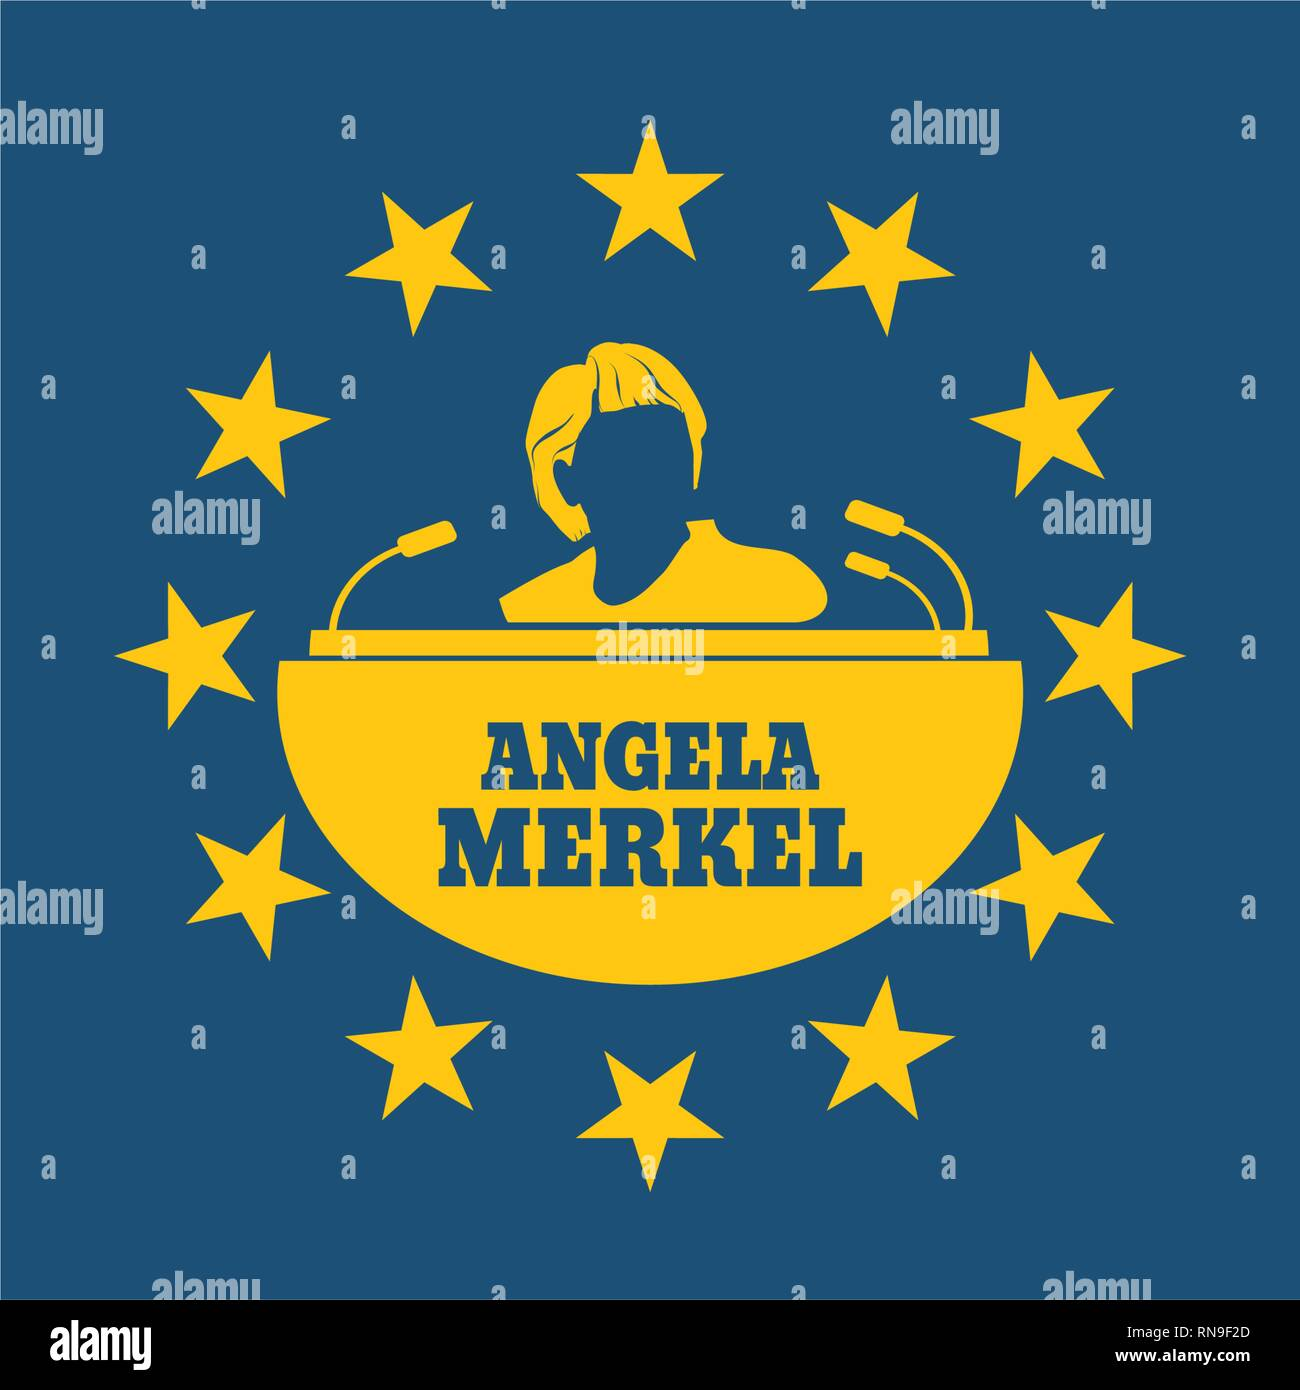 Angela Merkel simple portrait - Stock Vector